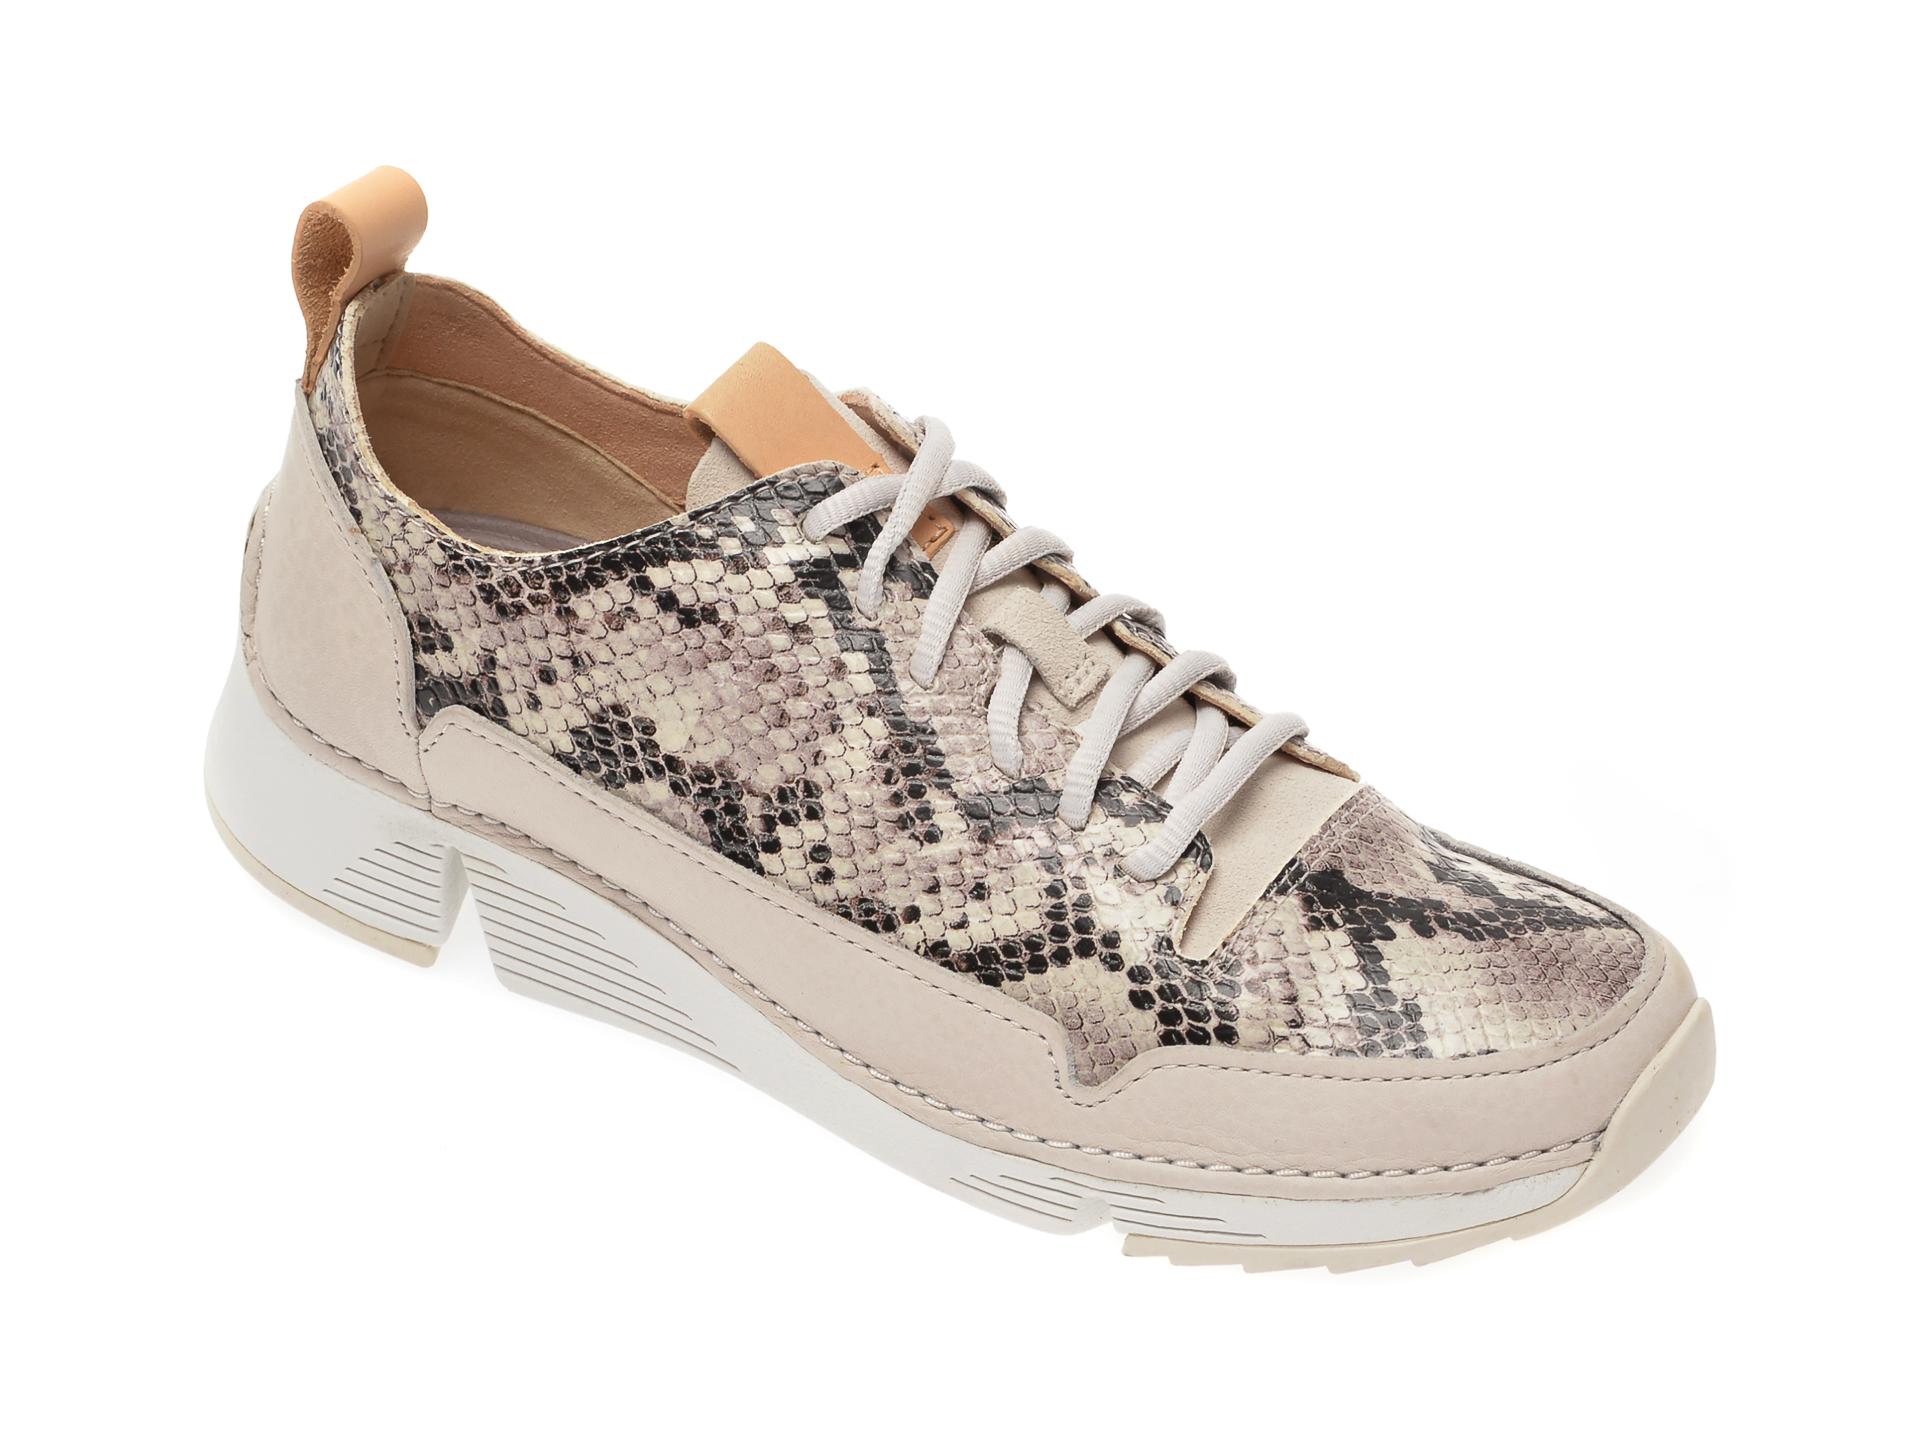 Pantofi CLARKS gri, Tri Spark, din piele naturala imagine